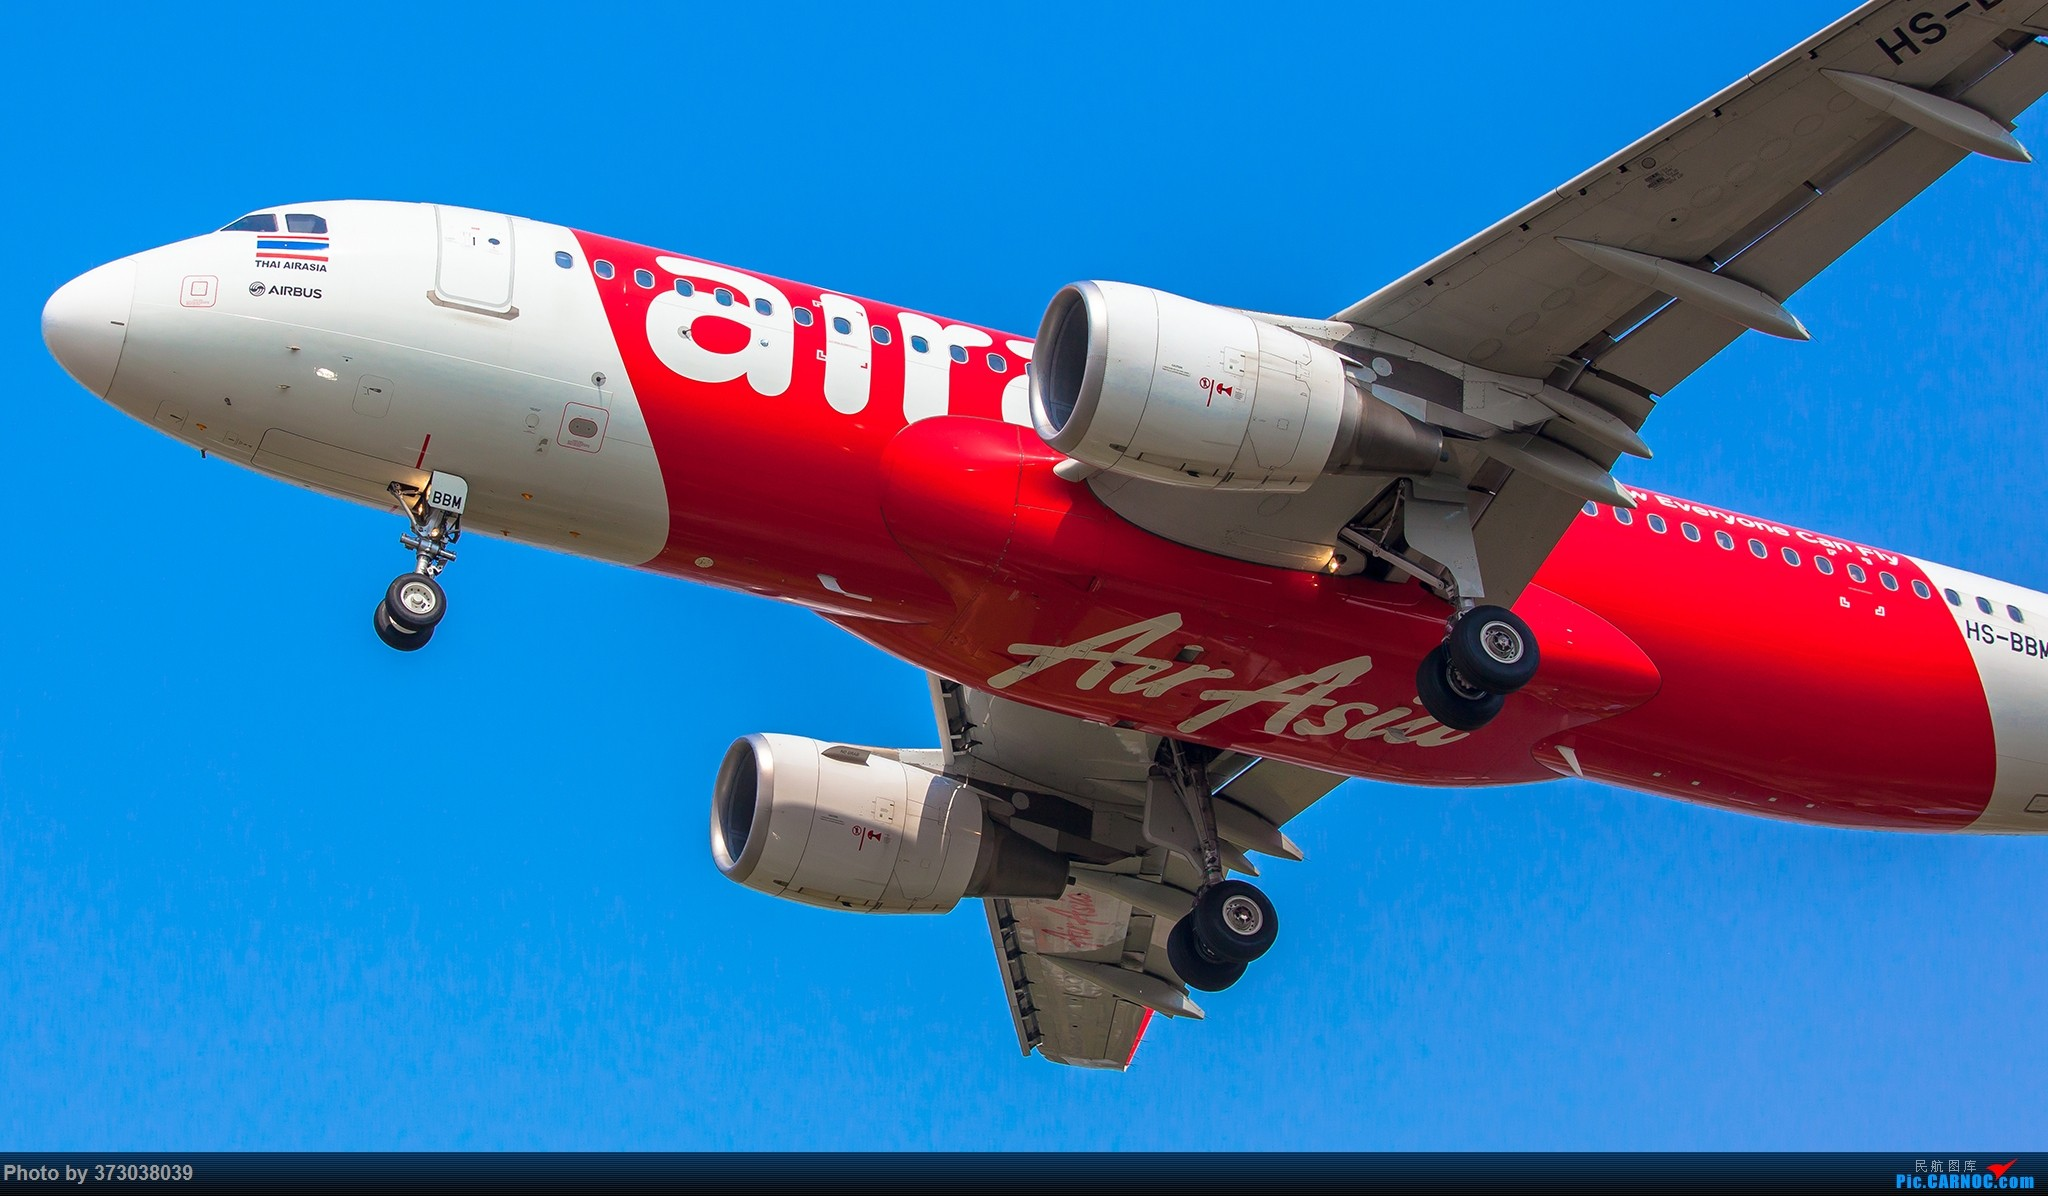 Re:[原创]立春 AIRBUS A319-100 HS-BBM 中国杭州萧山国际机场